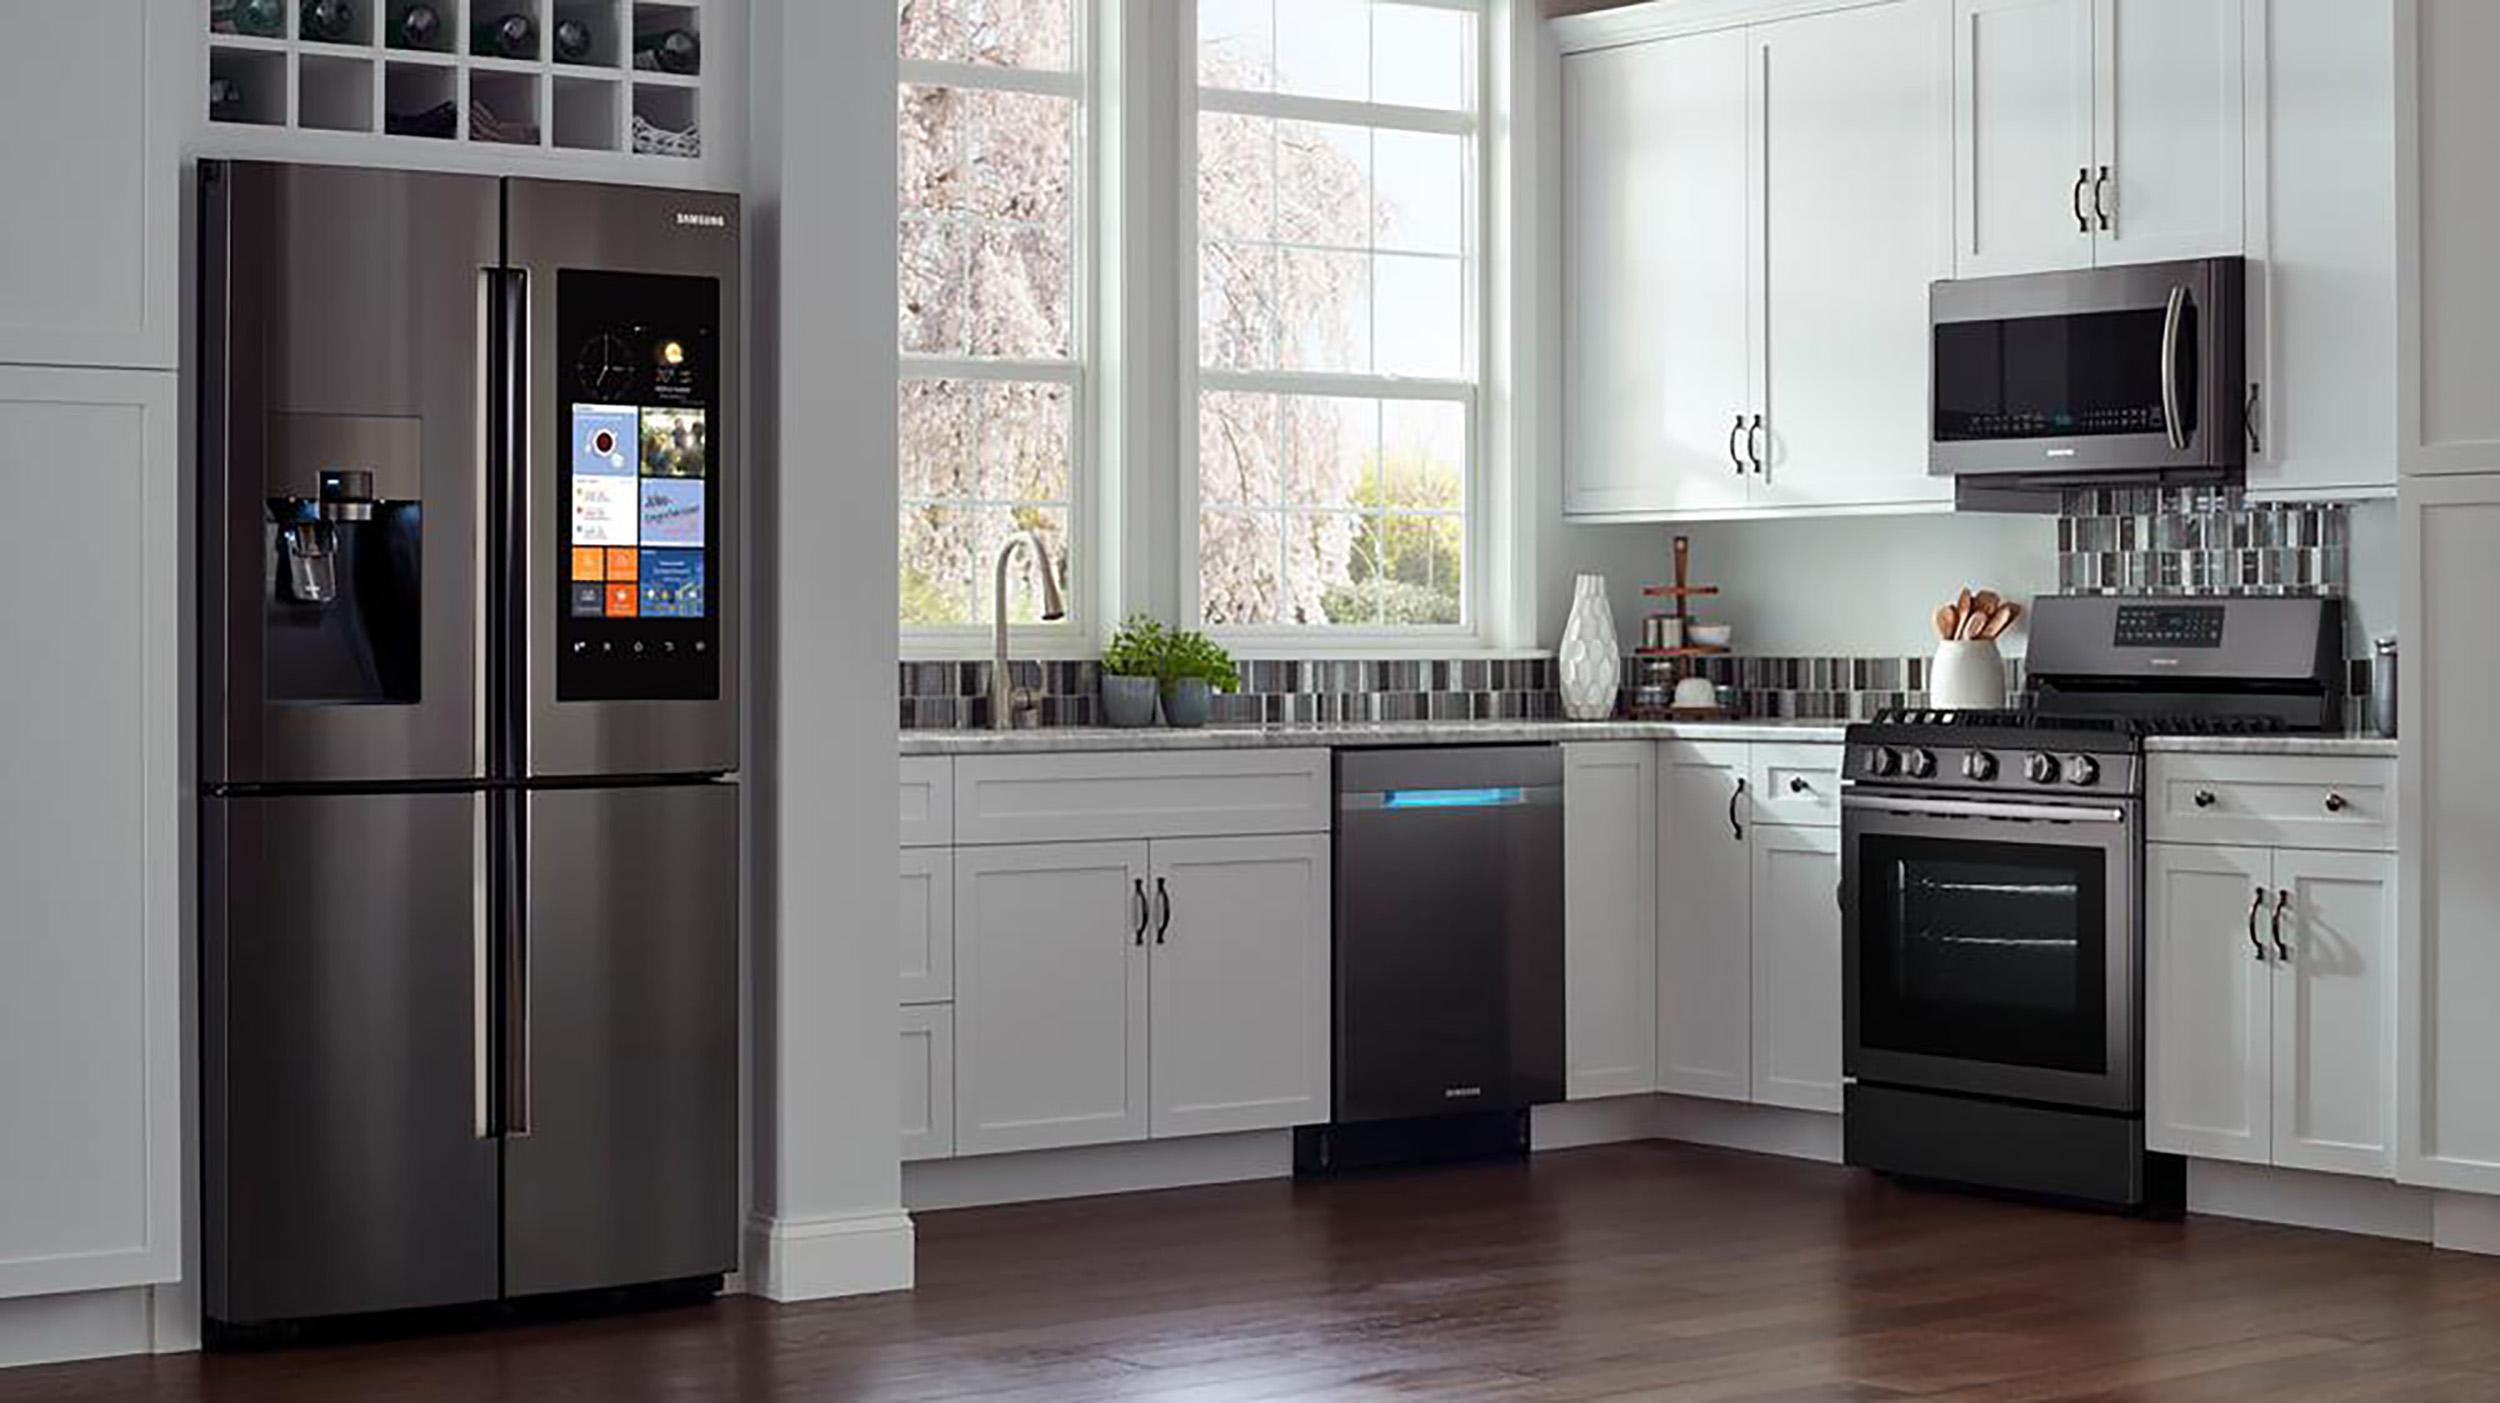 samsung sale ovens and refrigerators